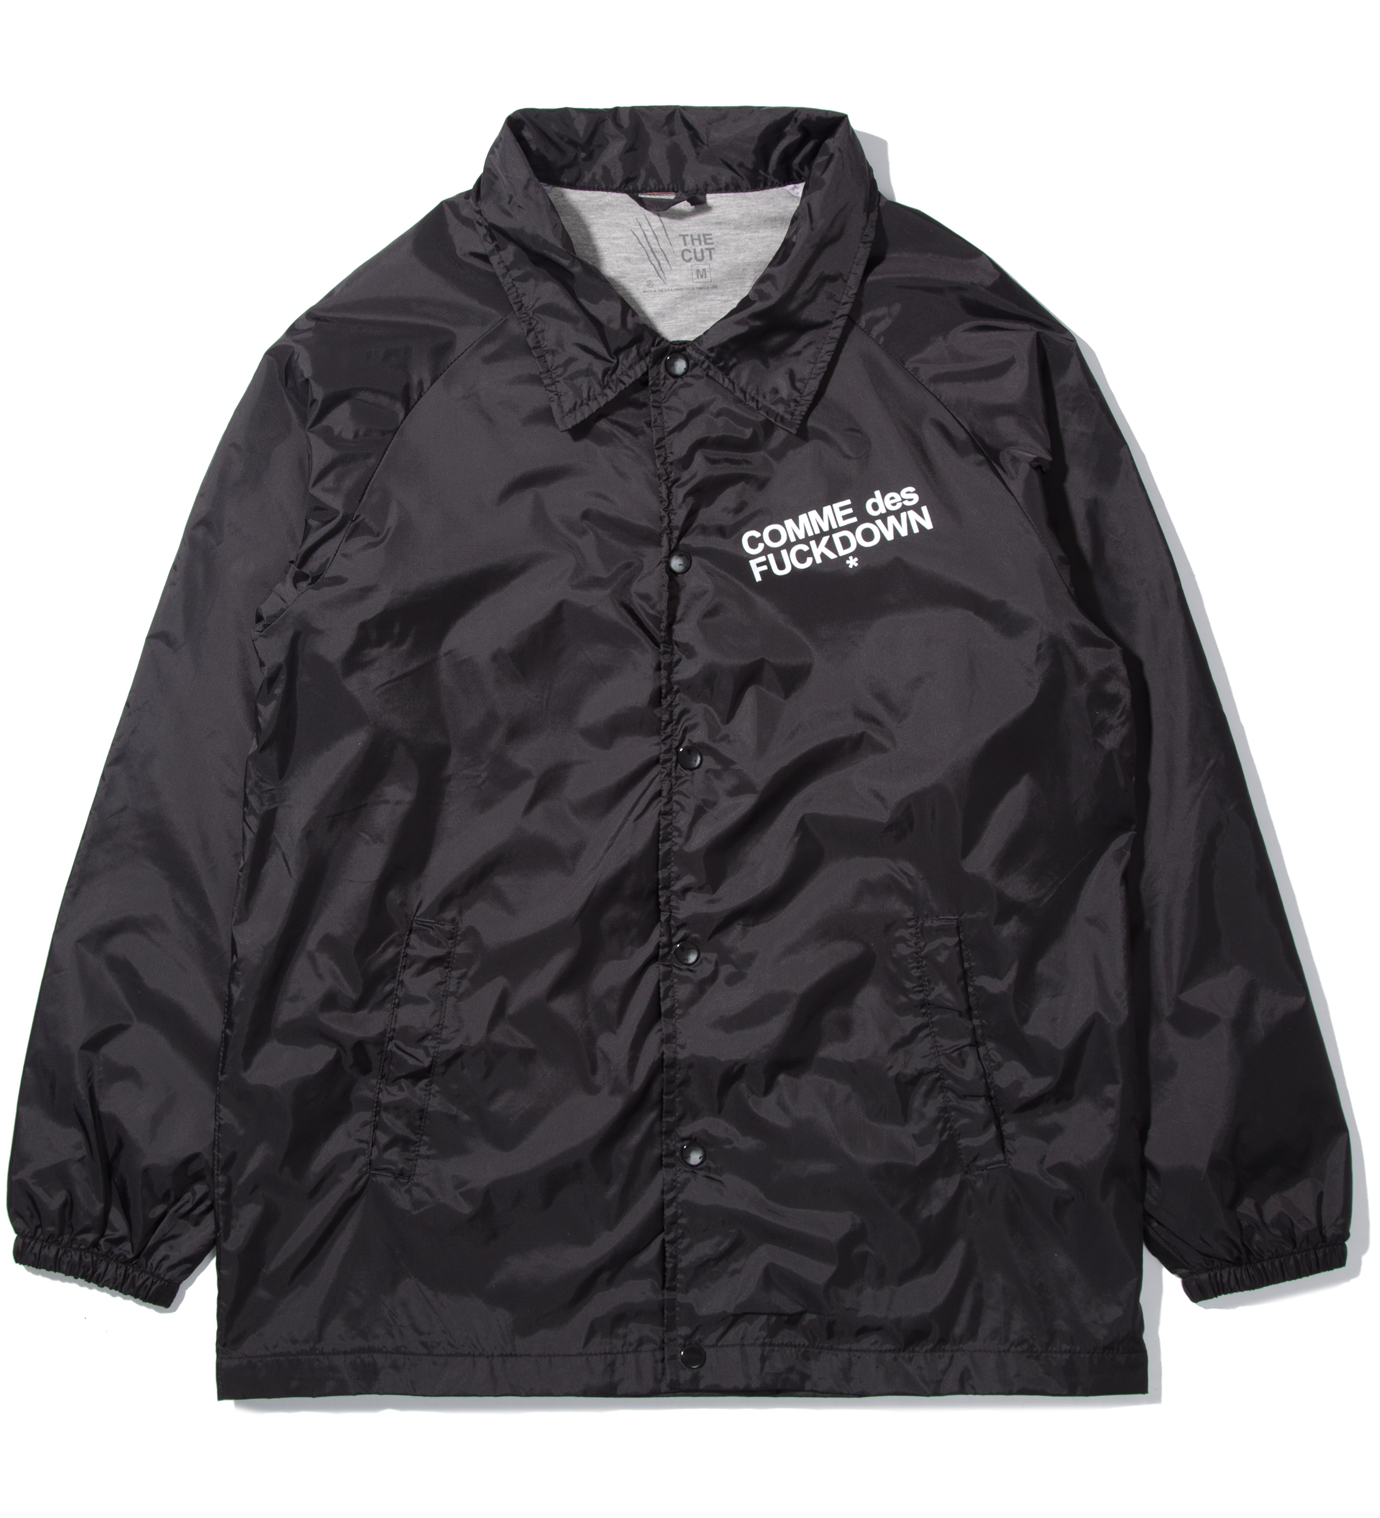 SSUR Black Comme Des Fuckdown Jacket